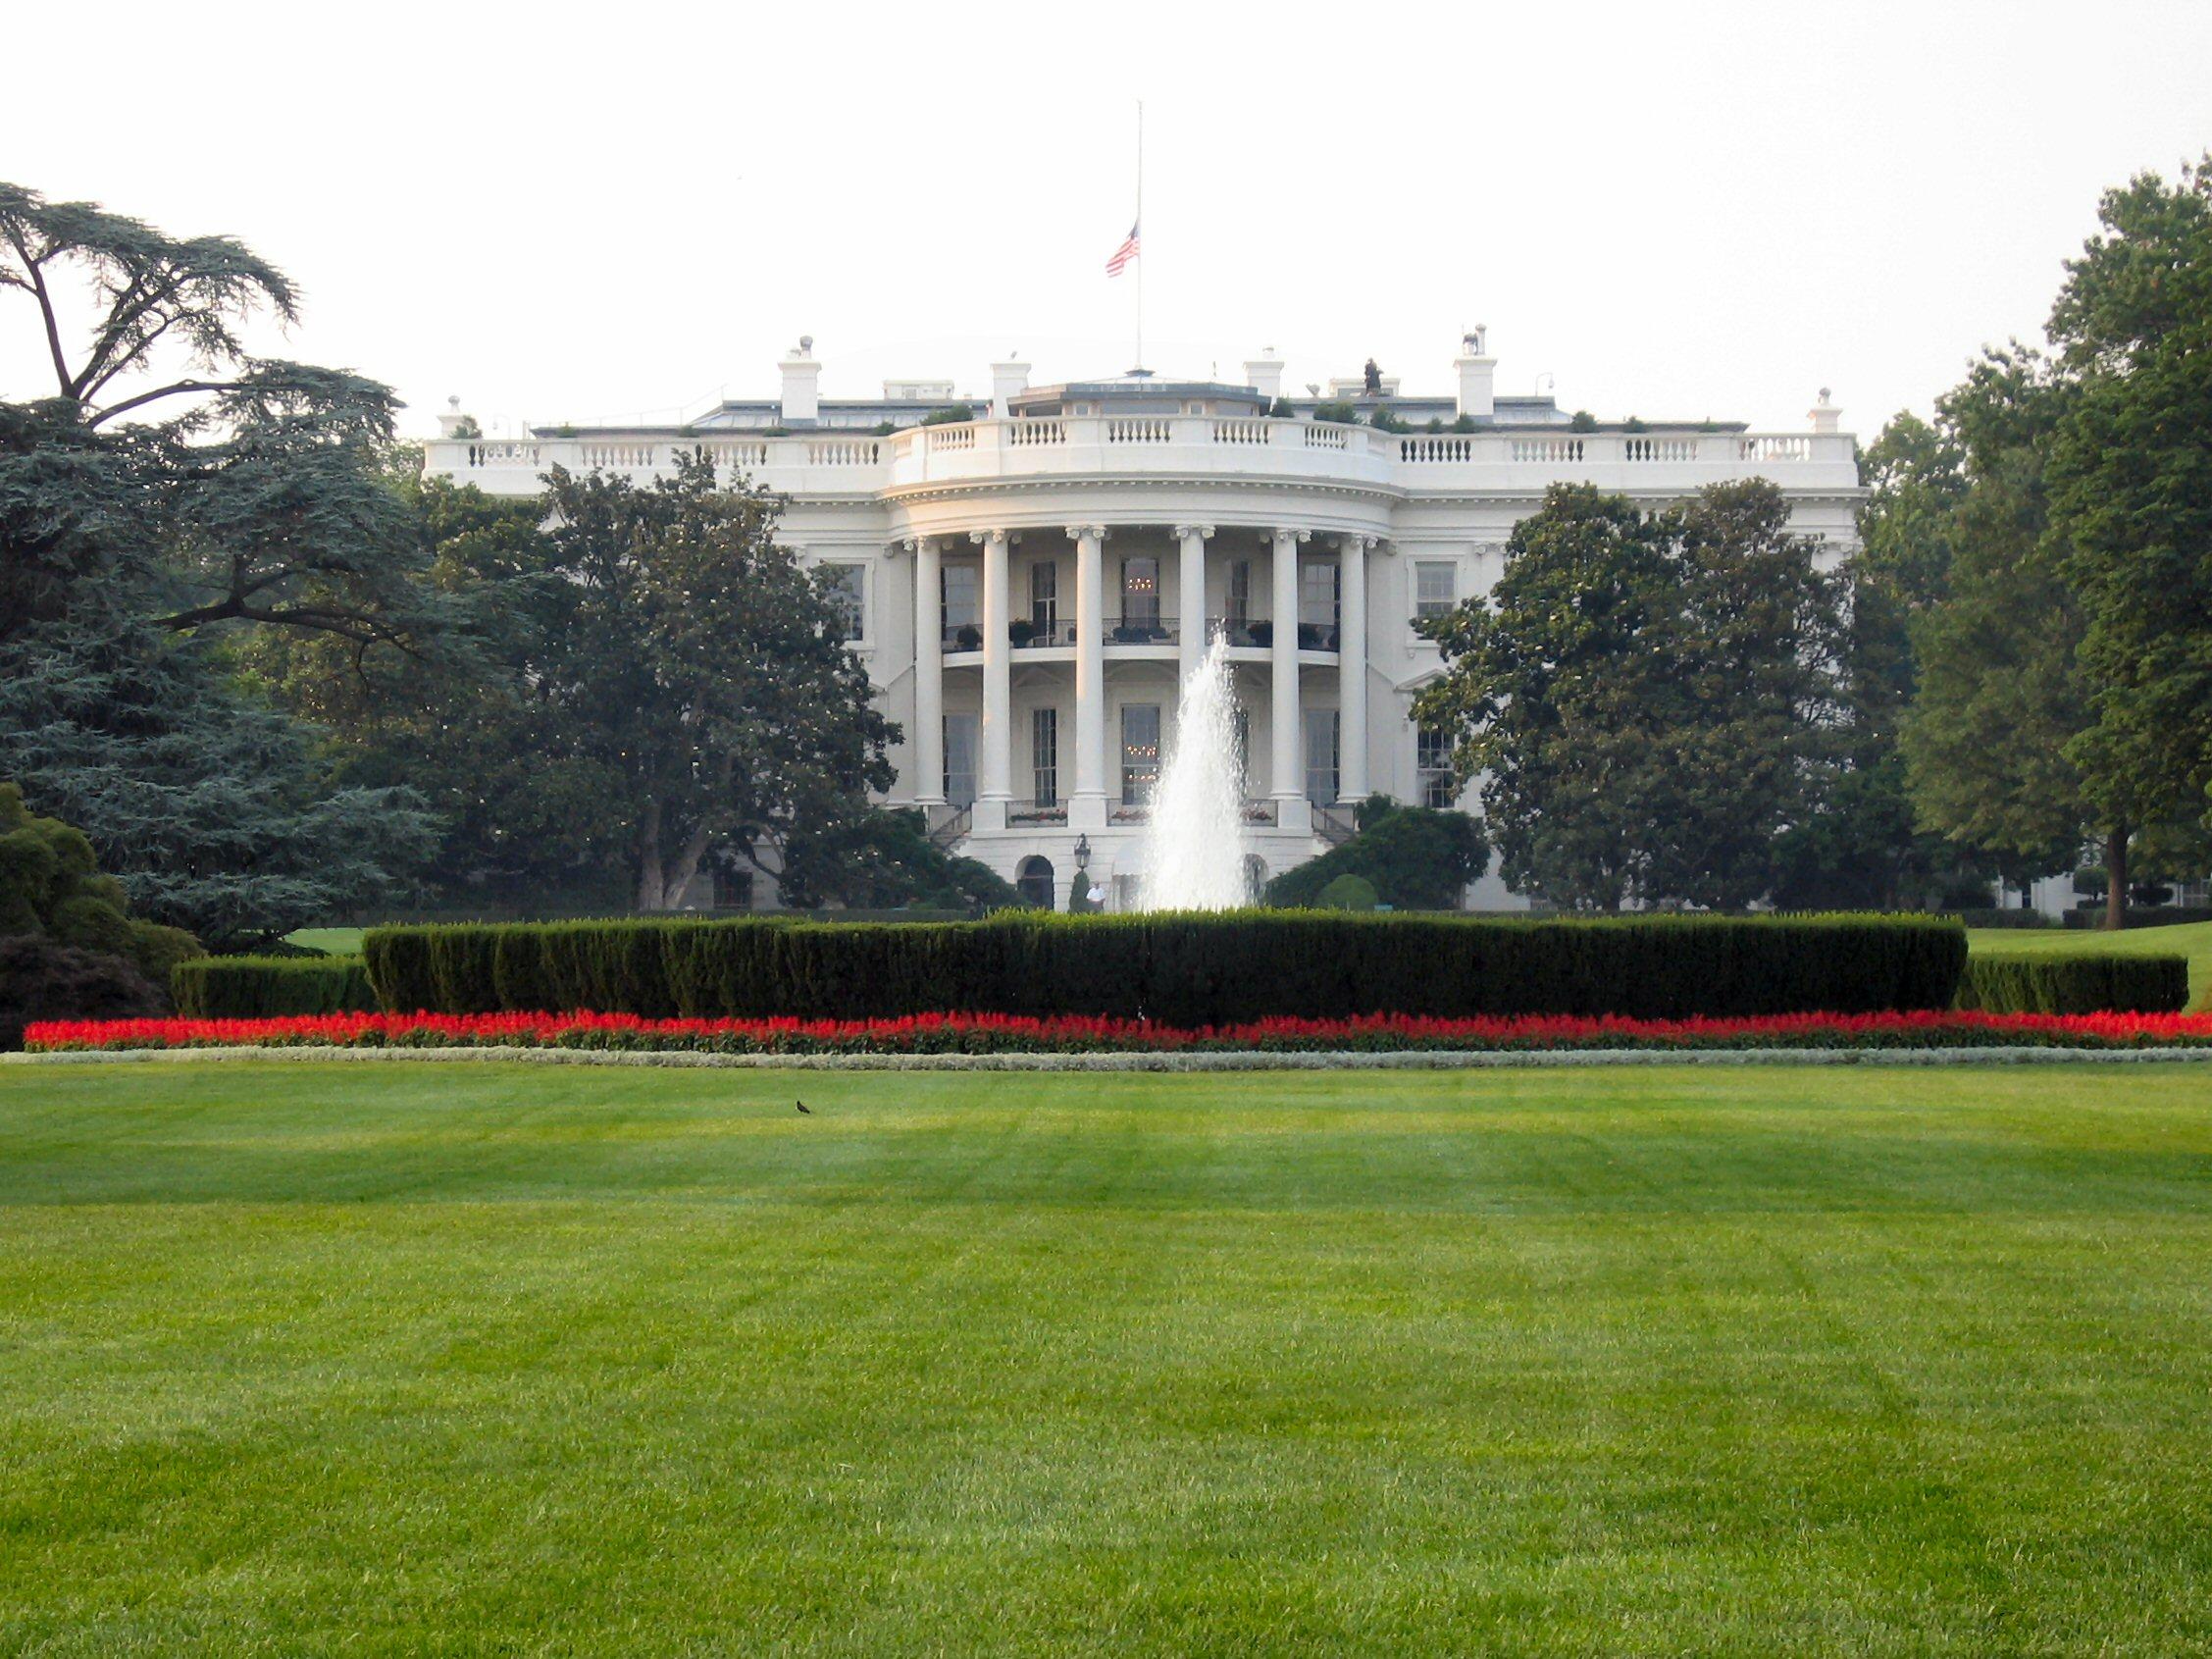 File:White House (south side).jpg - Wikipedia, the free encyclopedia